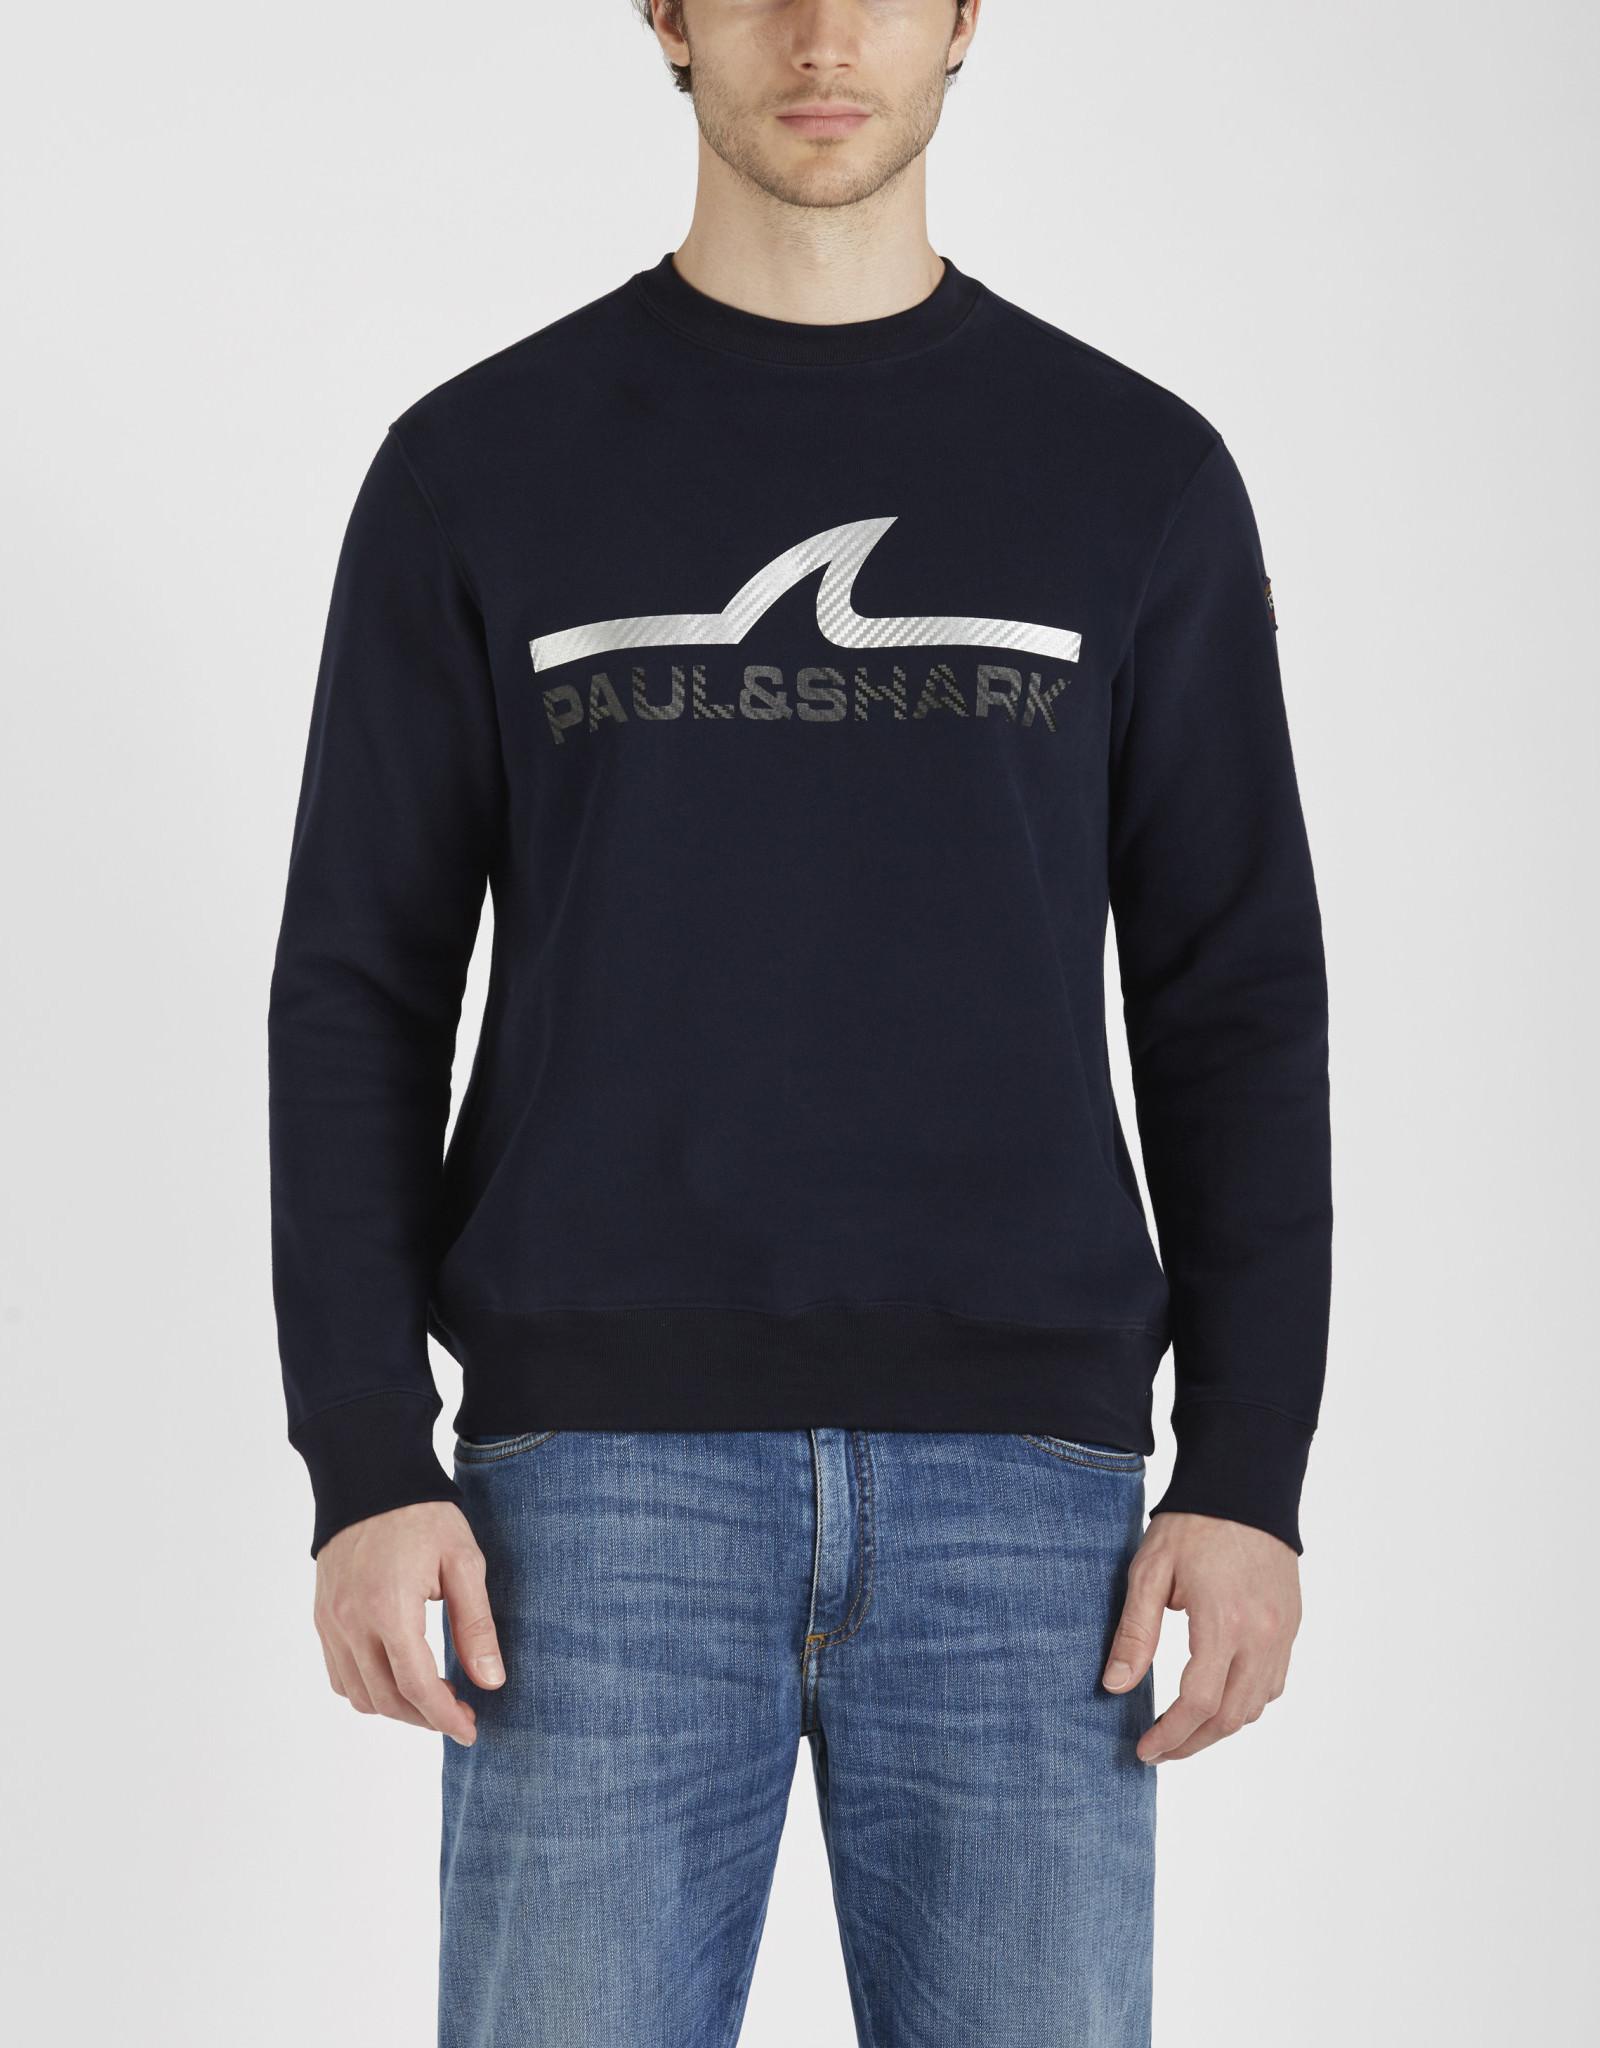 Paul & Shark sweater marine